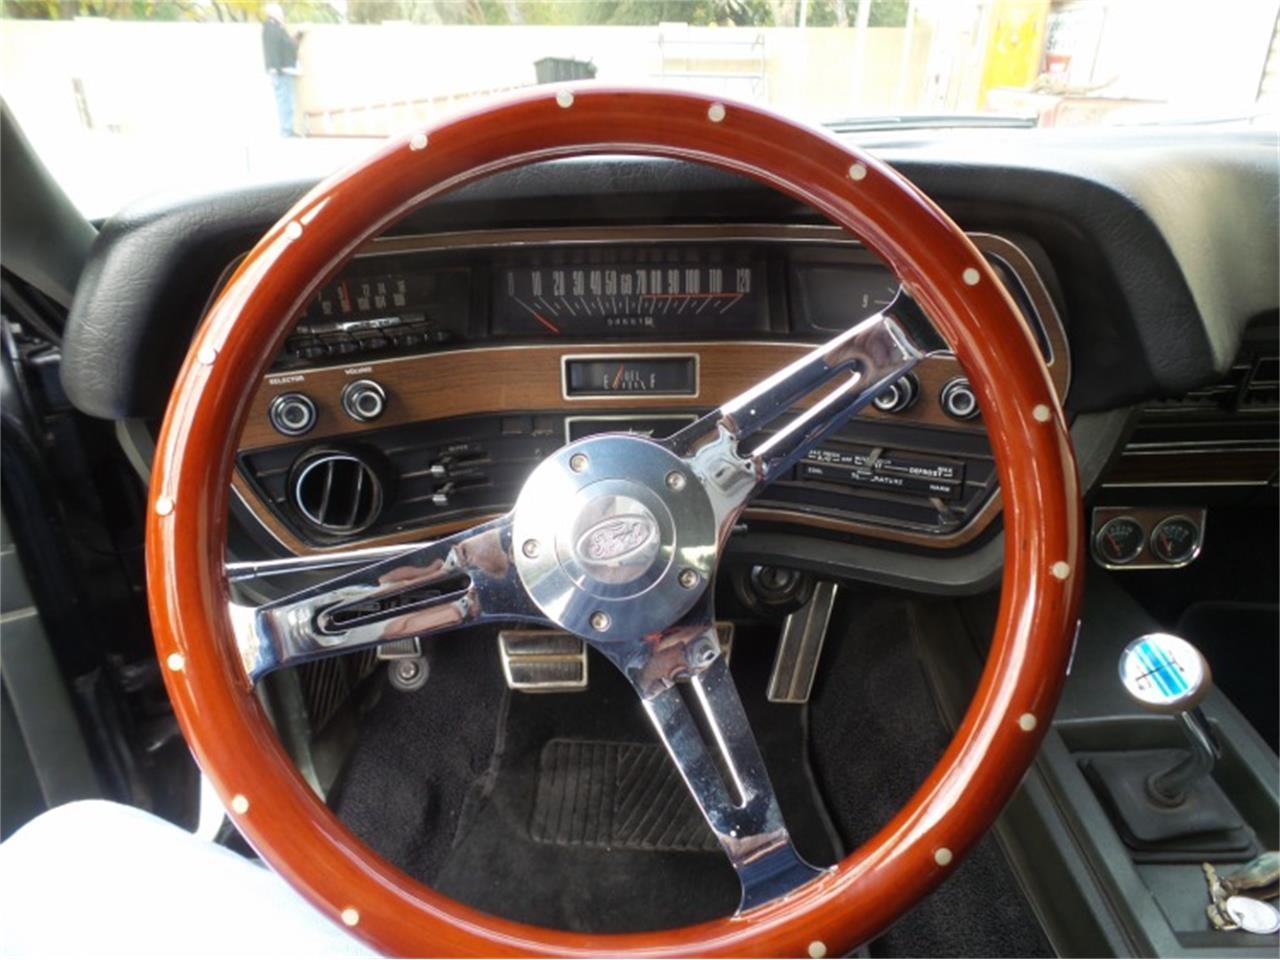 1969 Ford Galaxie XL (CC-1303341) for sale in Peoria, Arizona